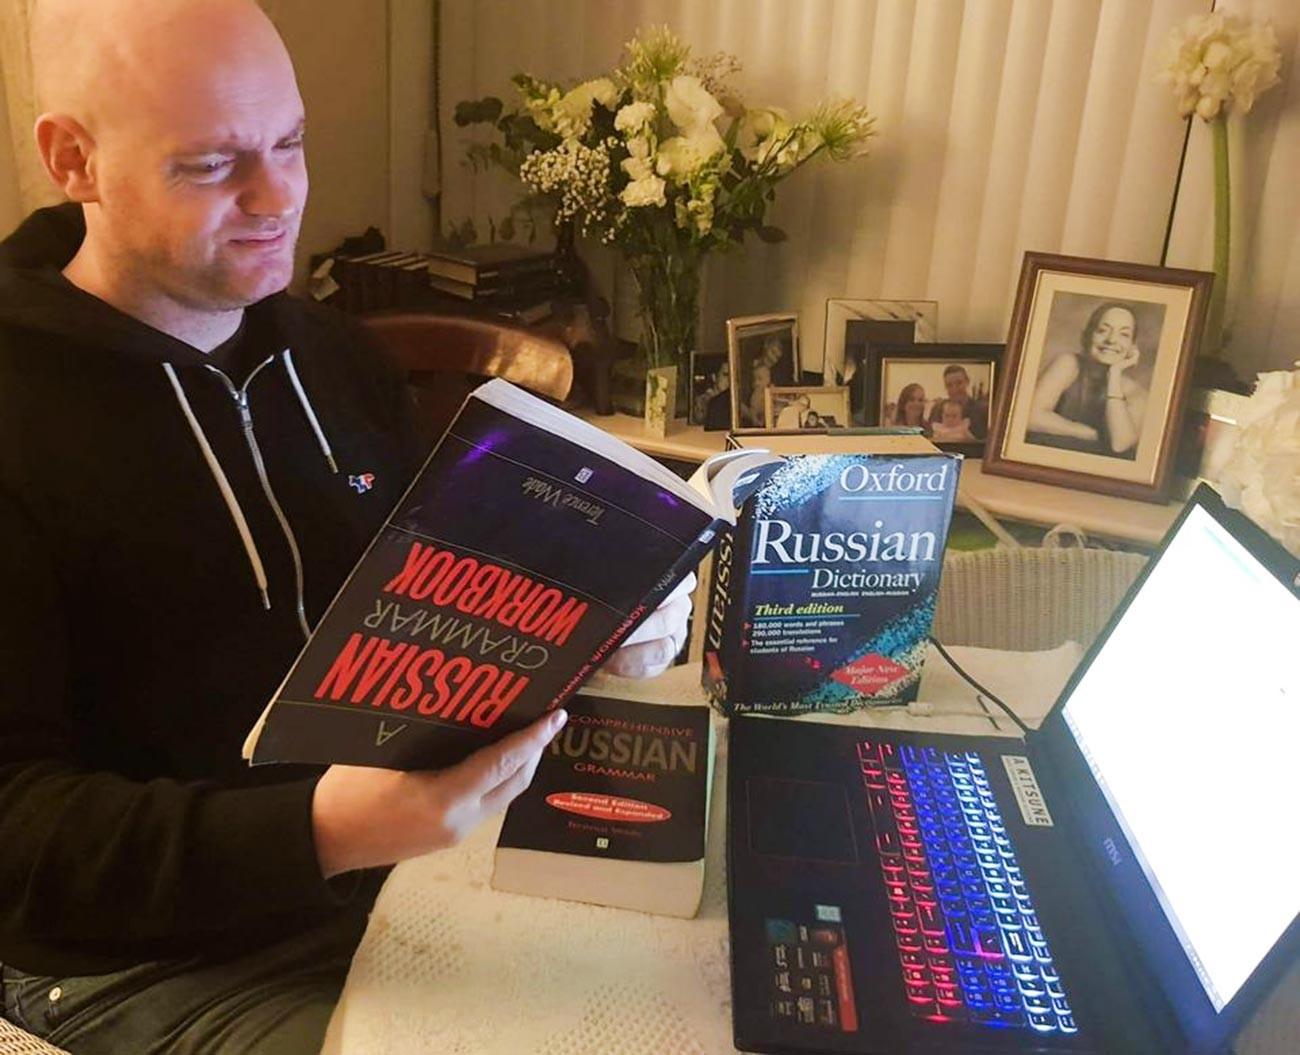 If only 'A Russian grammar workbook' helped to speak fluently...